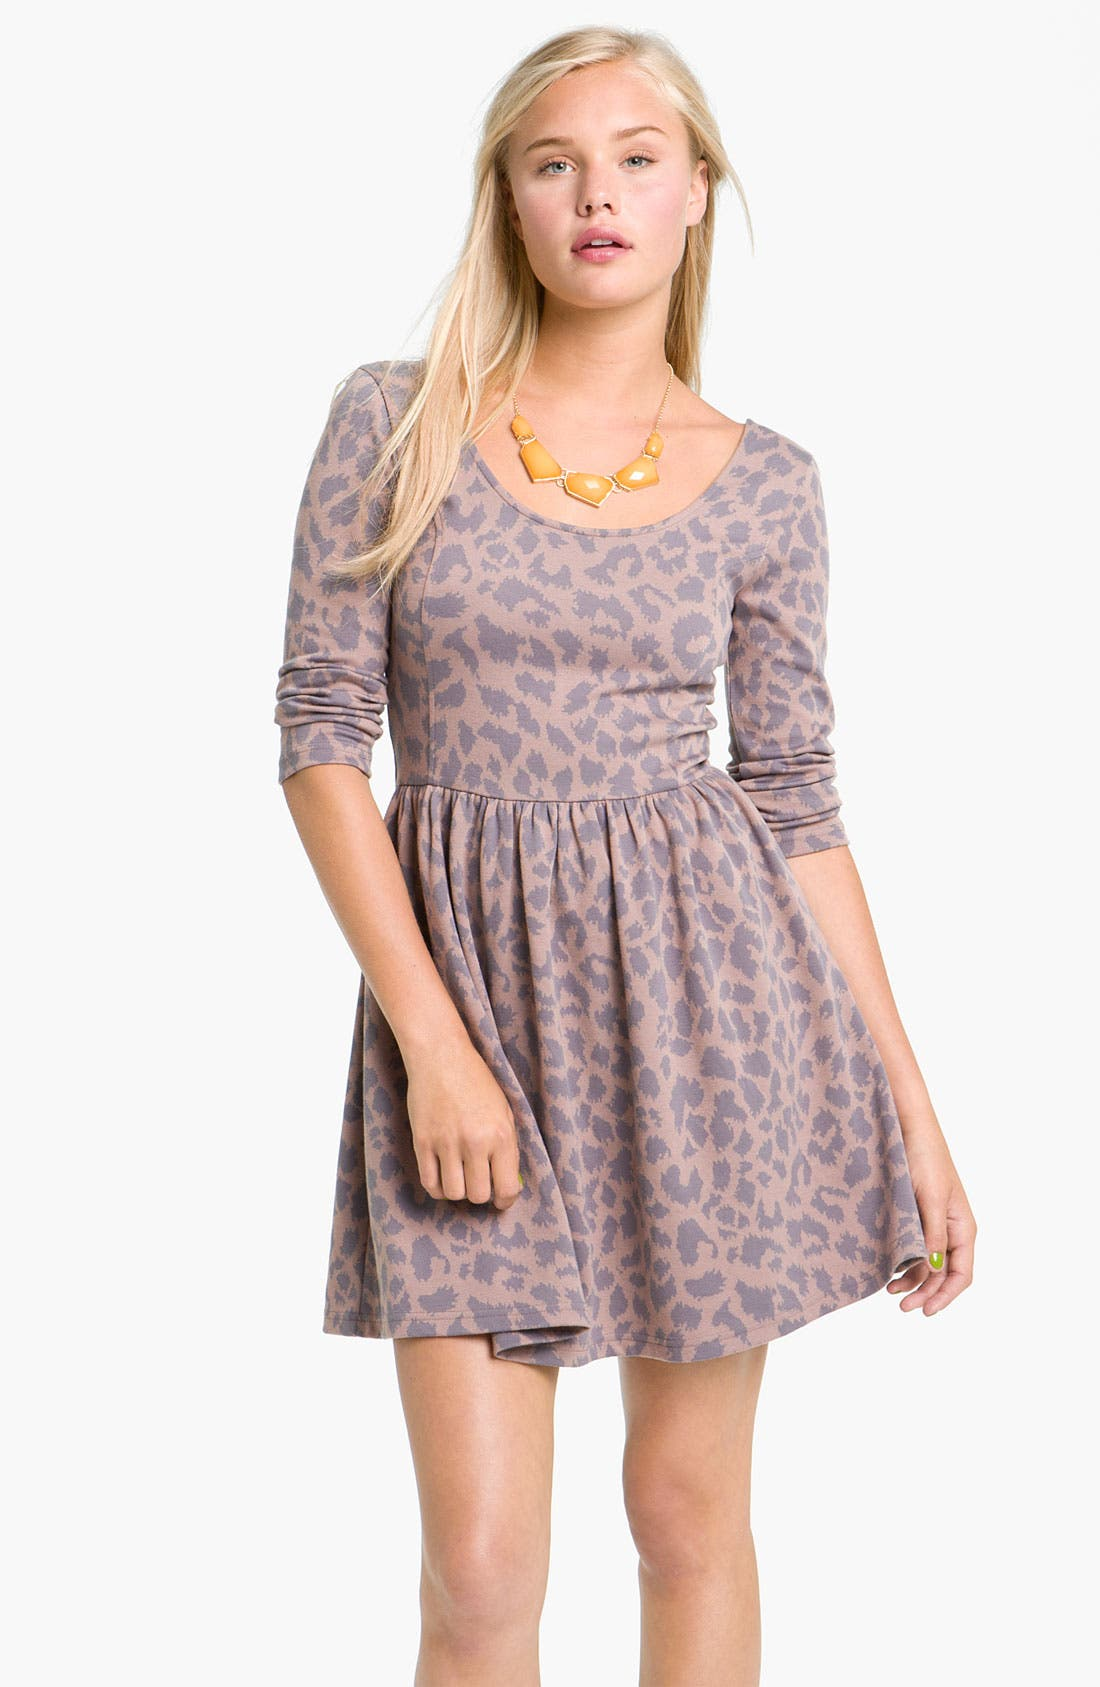 Main Image - Frenchi® Leopard Print Knit Dress